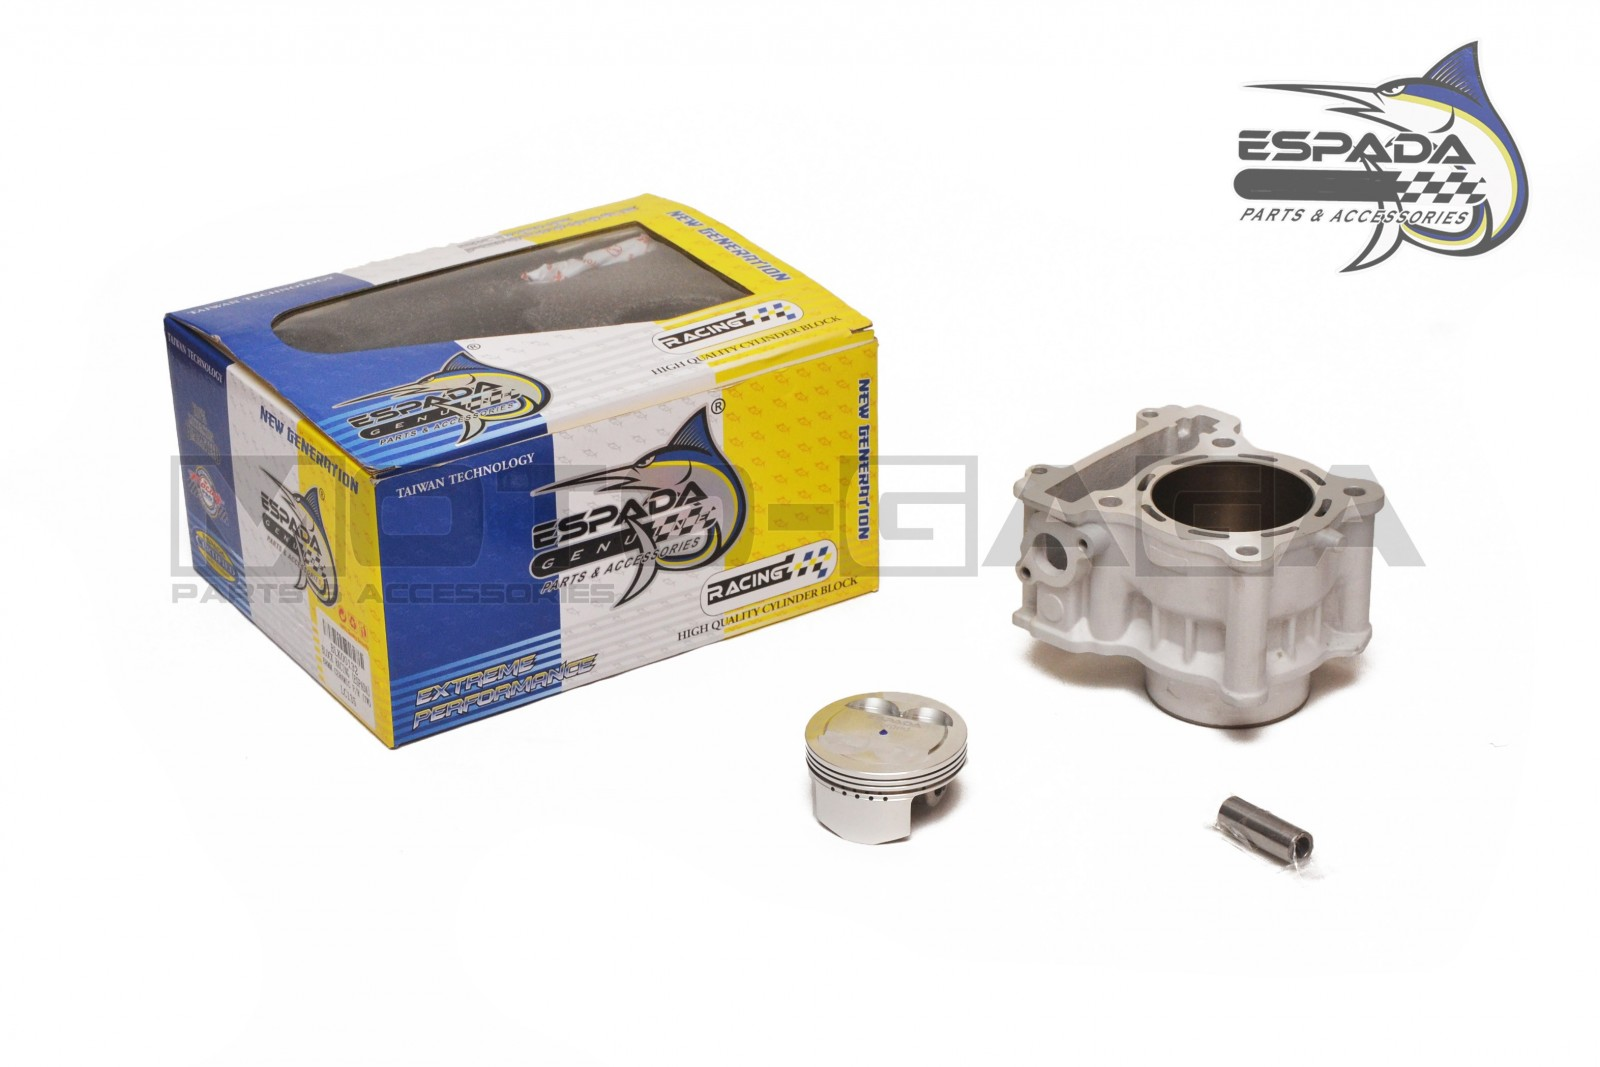 Espada Racing 68mm (213cc) Big Bore Cylinder Kit - Yamaha YZF-R15/Fz150i  Vixion/ MT-15/R125/M-Slaz/ LC135/Y15ZR/JupiterMX T150